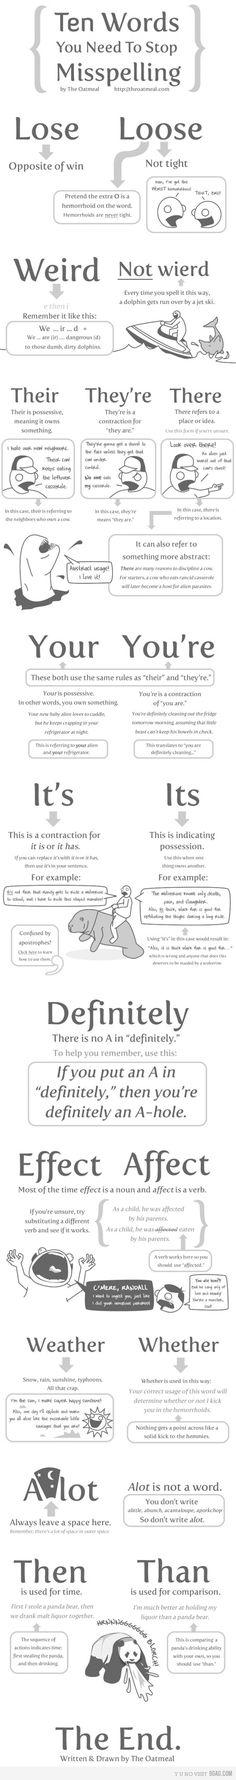 Infographic: Ten Words You Need To Stop Misspelling